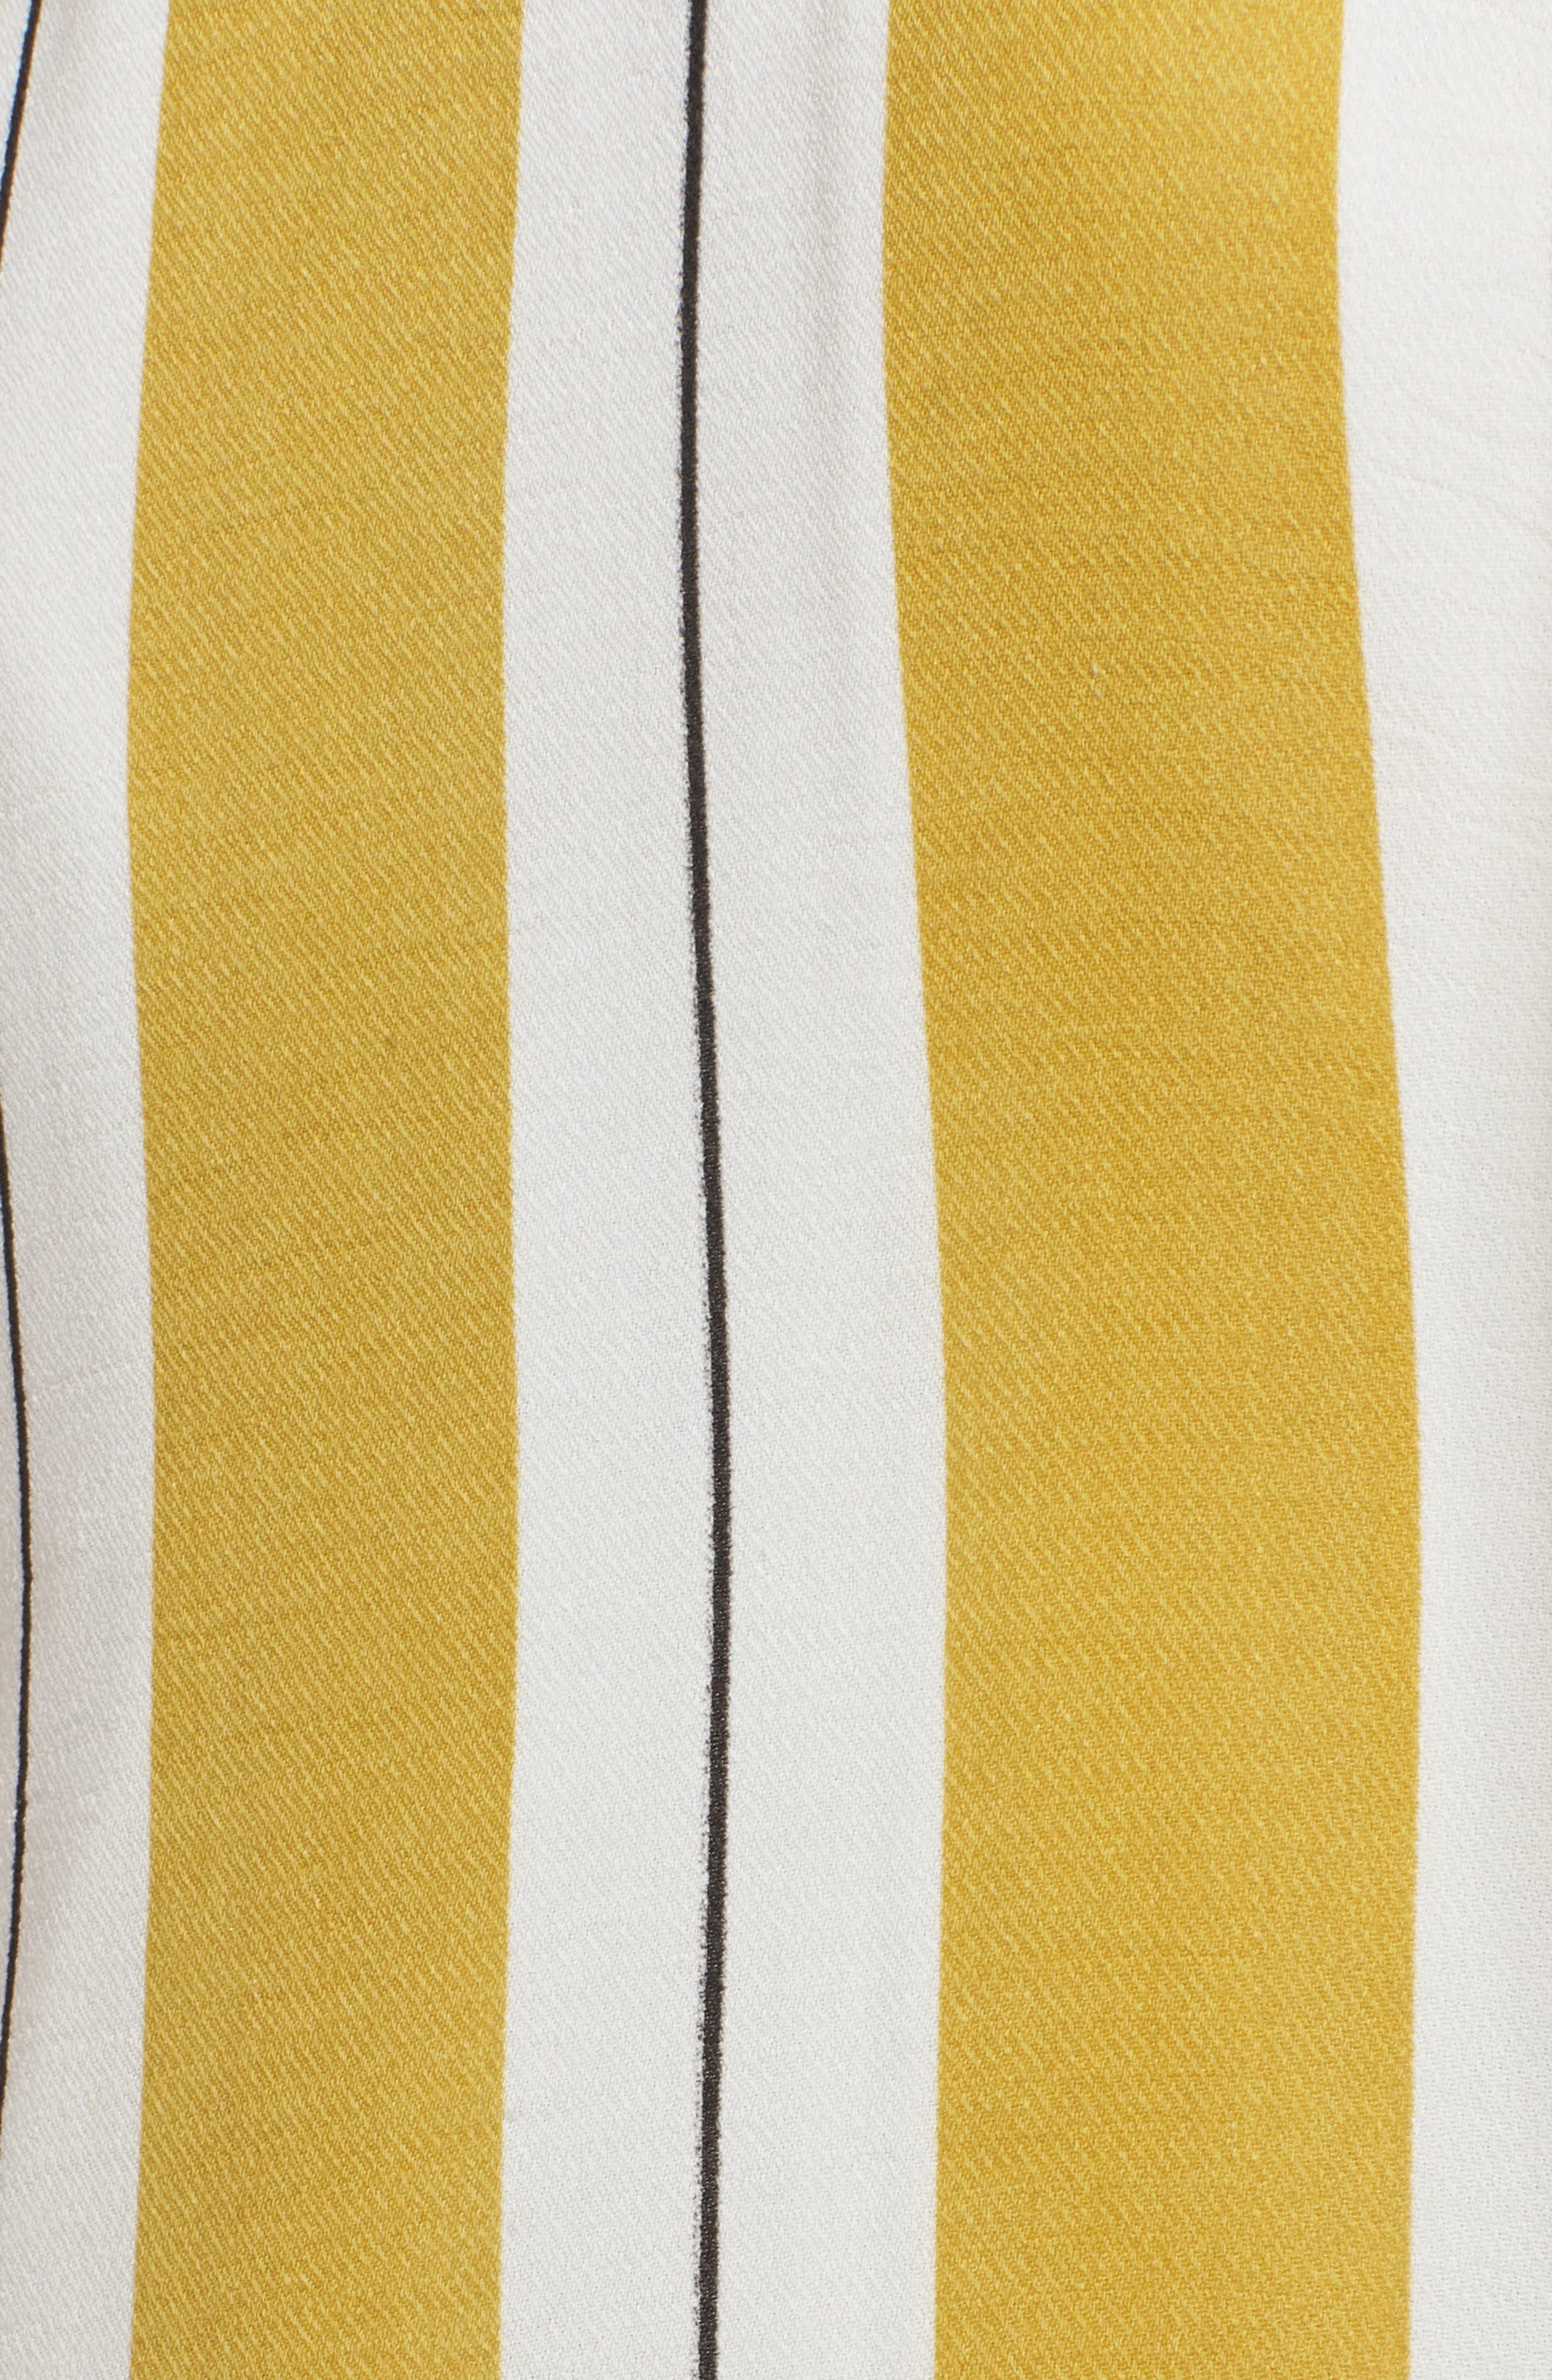 Stripe Midi Dress,                             Alternate thumbnail 3, color,                             Yellow Stripe Per Sample